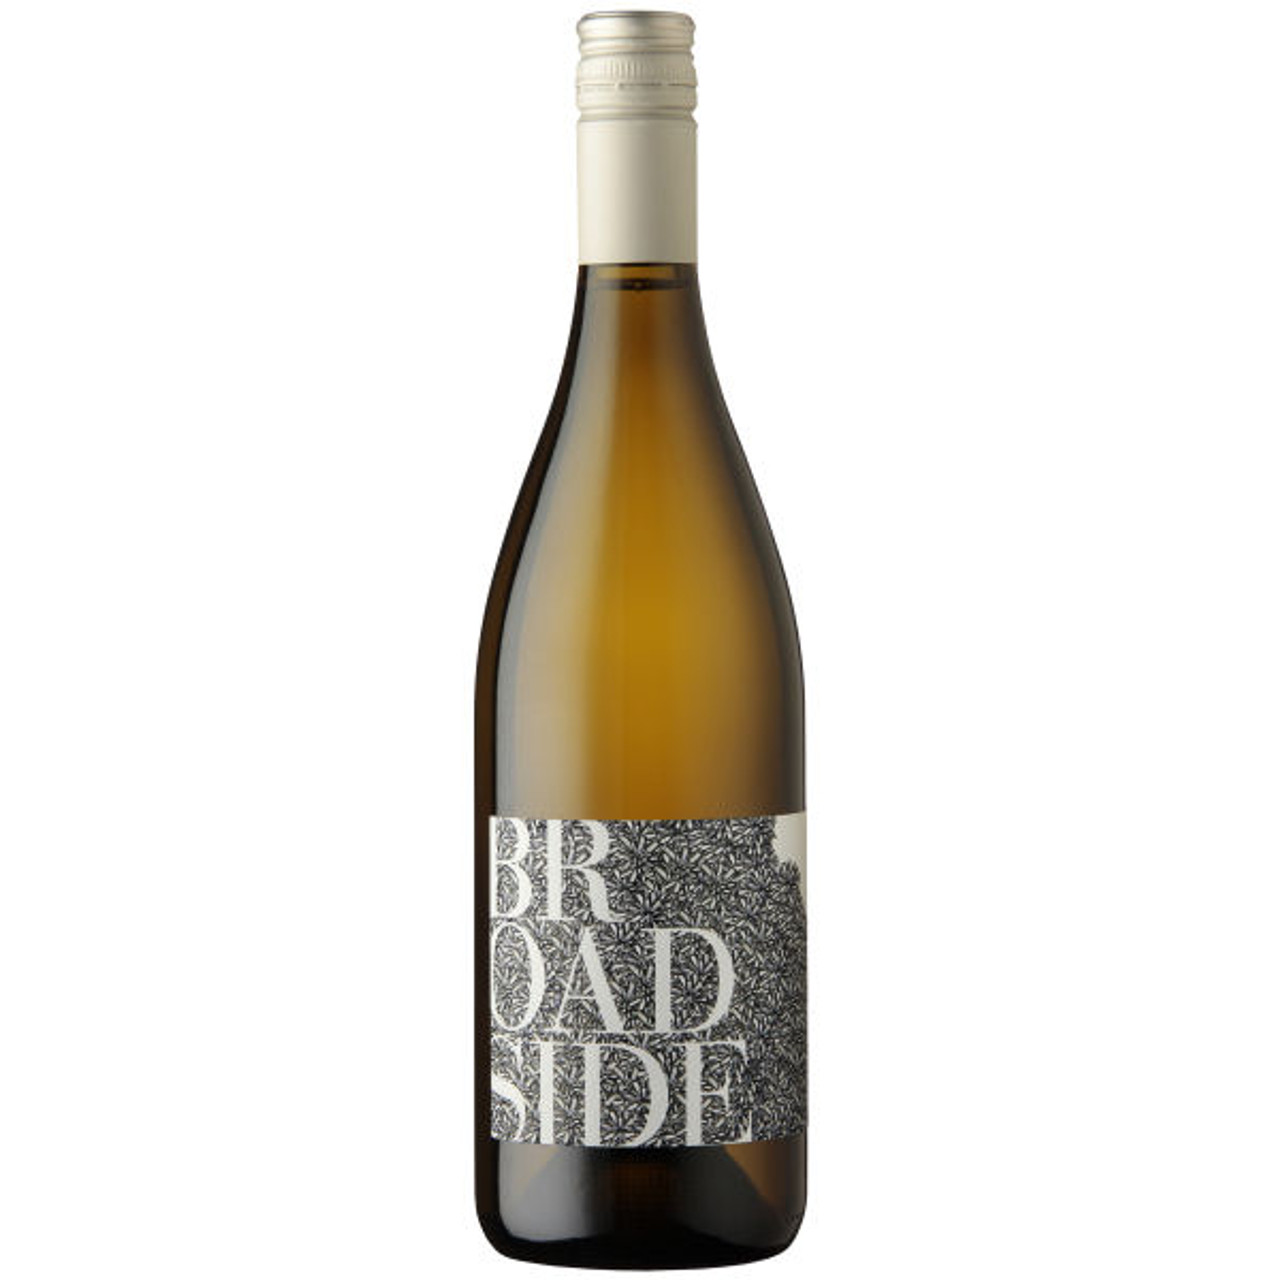 Broadside Central Coast Chardonnay